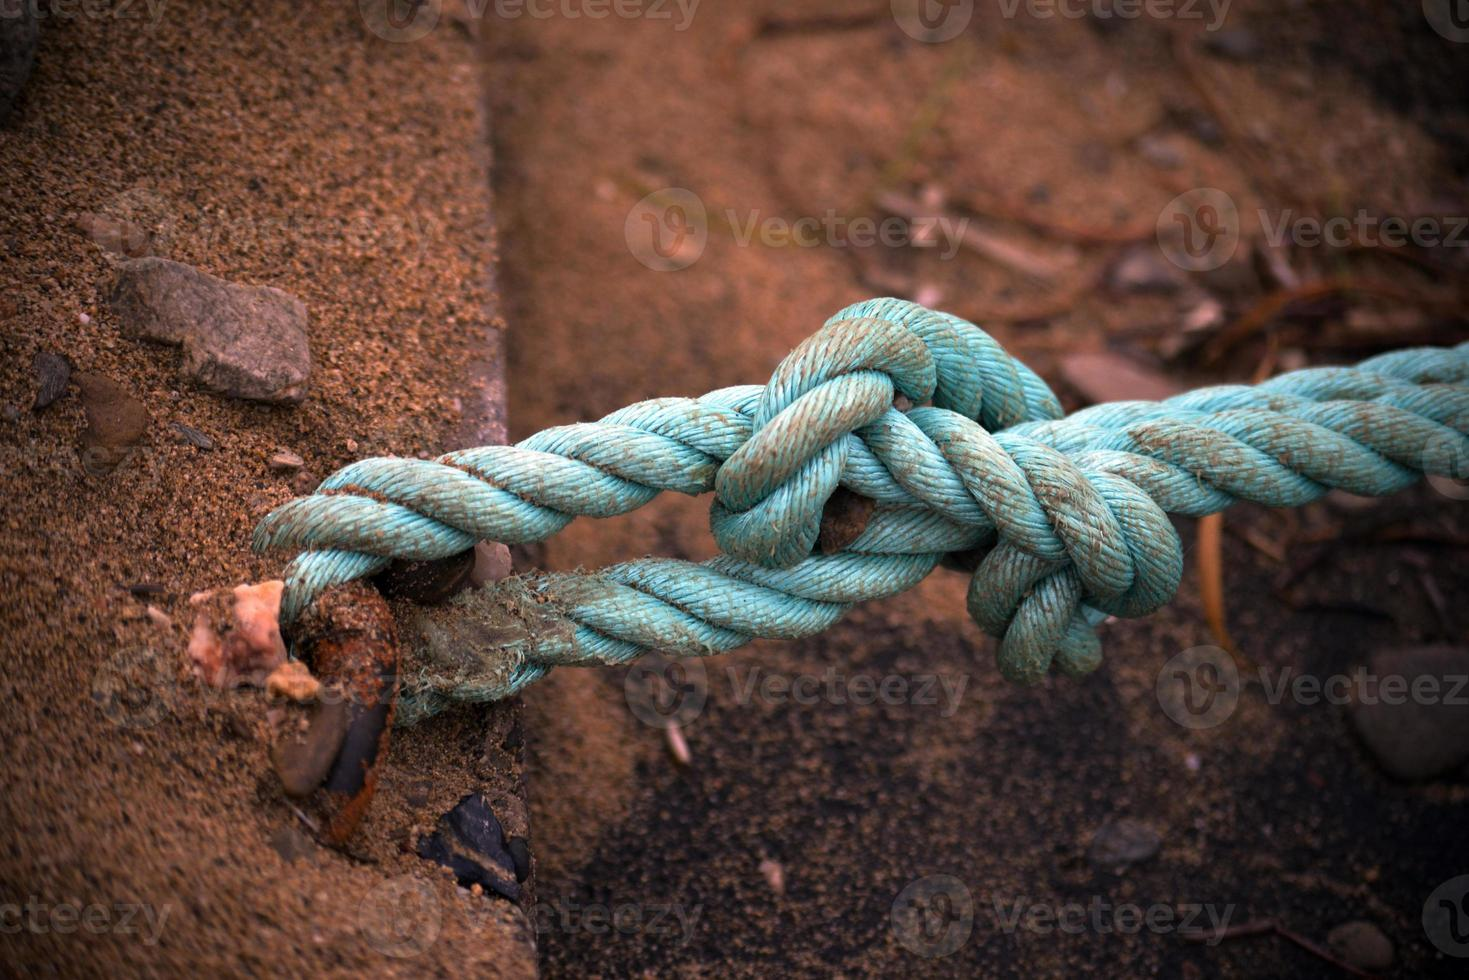 Blue rope photo